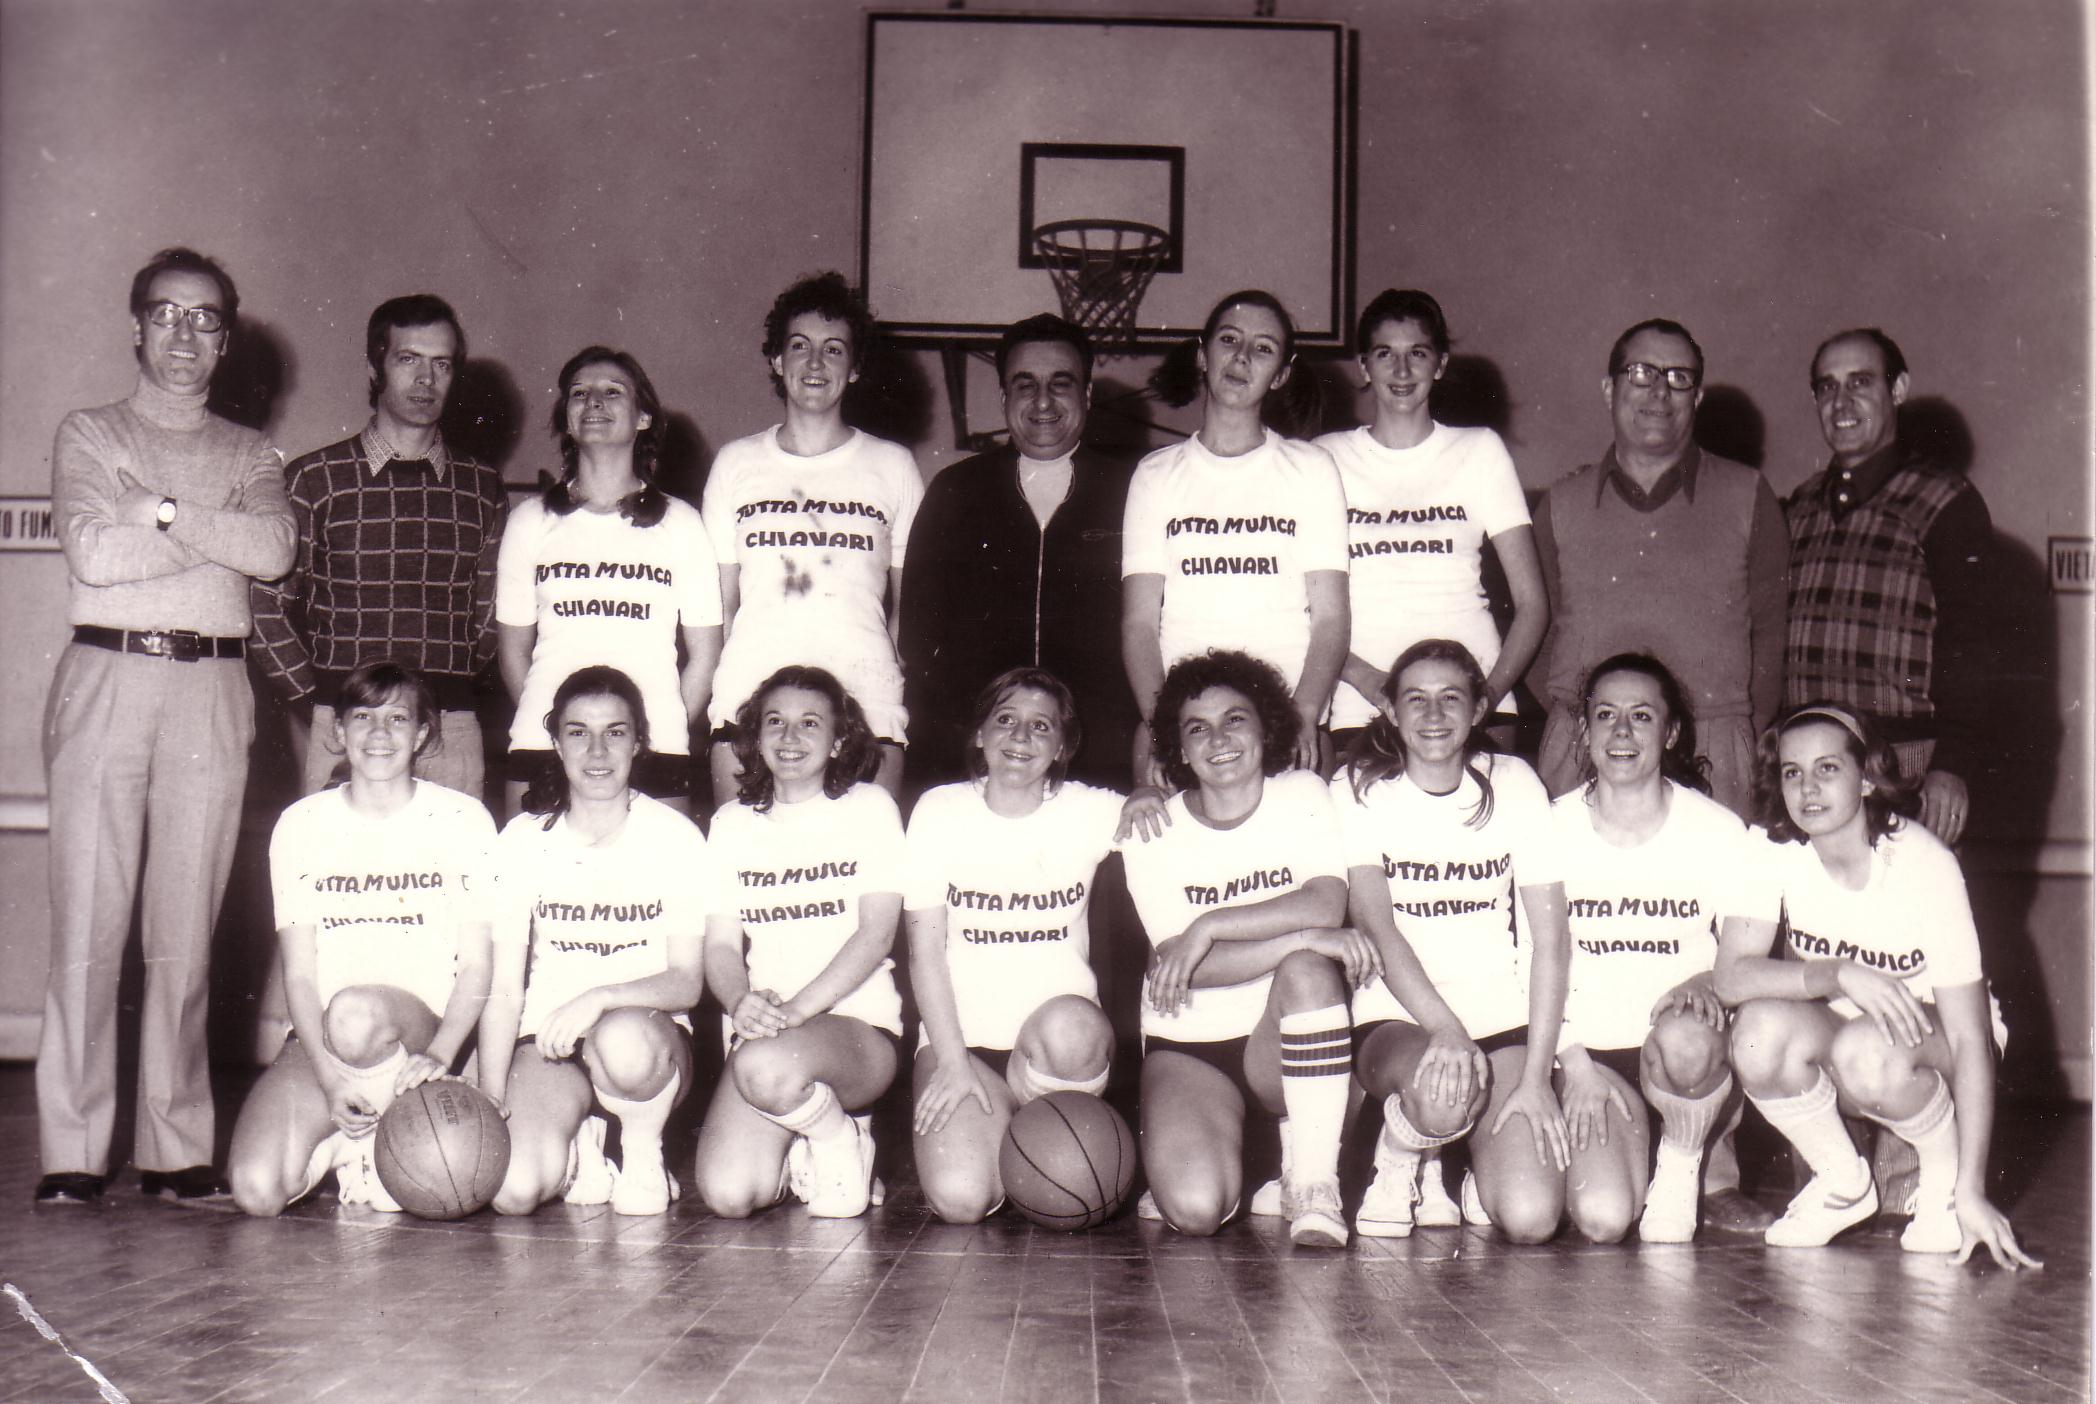 camp-to-serie-c-femm-le-1974-1975